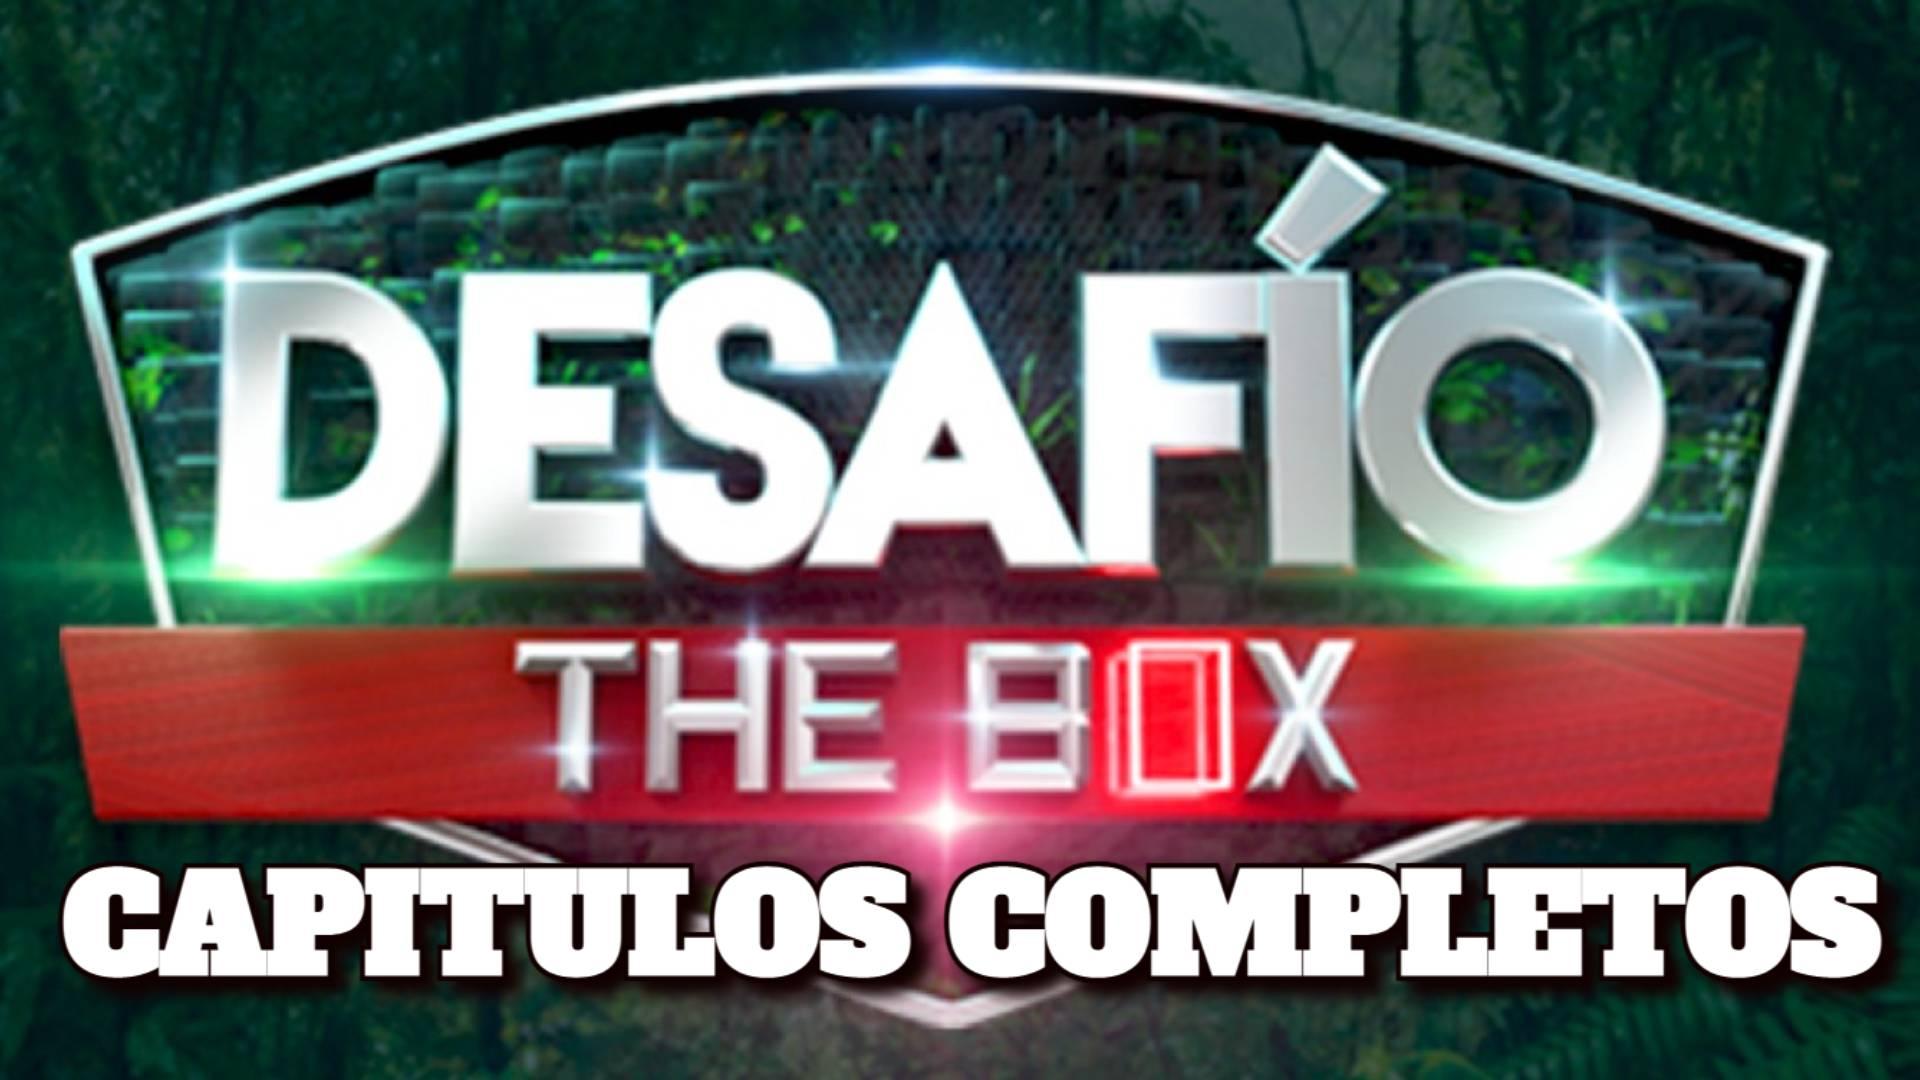 Desafio The Box 2021 CAPITULOS COMPLETOS GRATIS